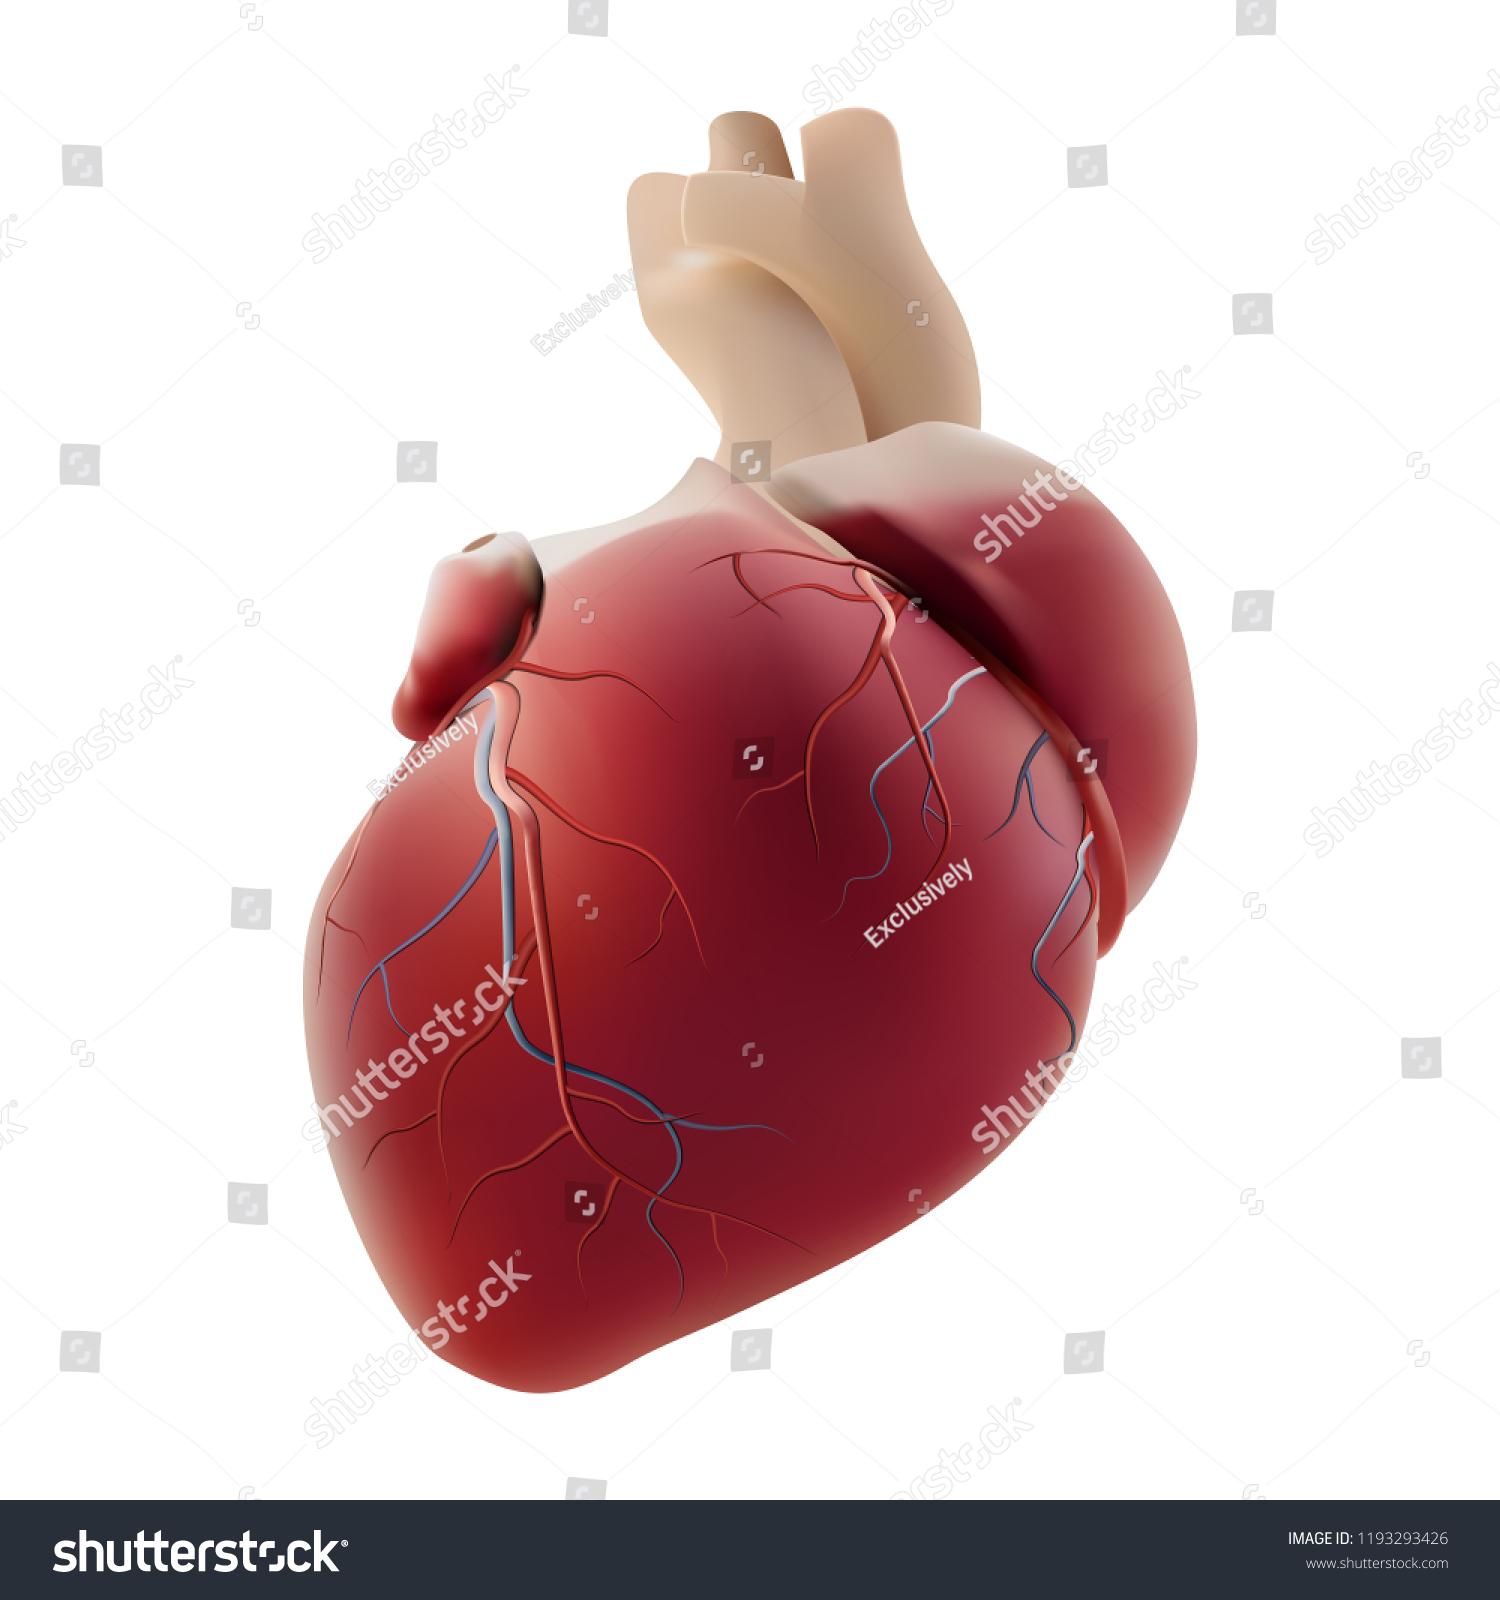 Realistic Heart Photorealistic Vector Layout Of A Human Organ Ez